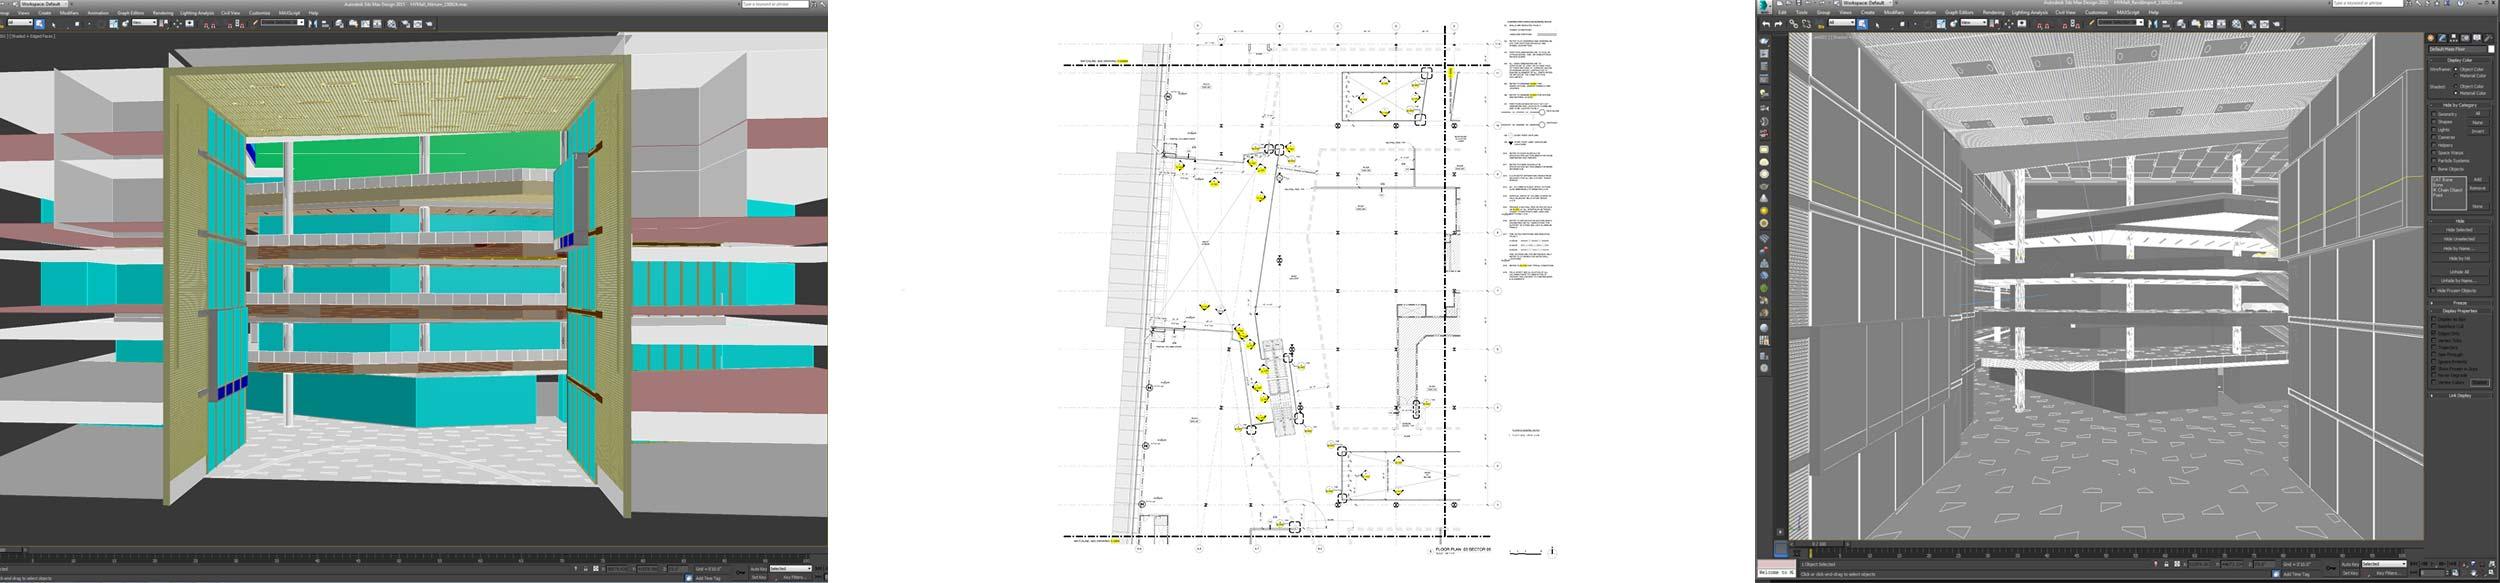 Starting design models and drawings by Kohn Pedersen Fox